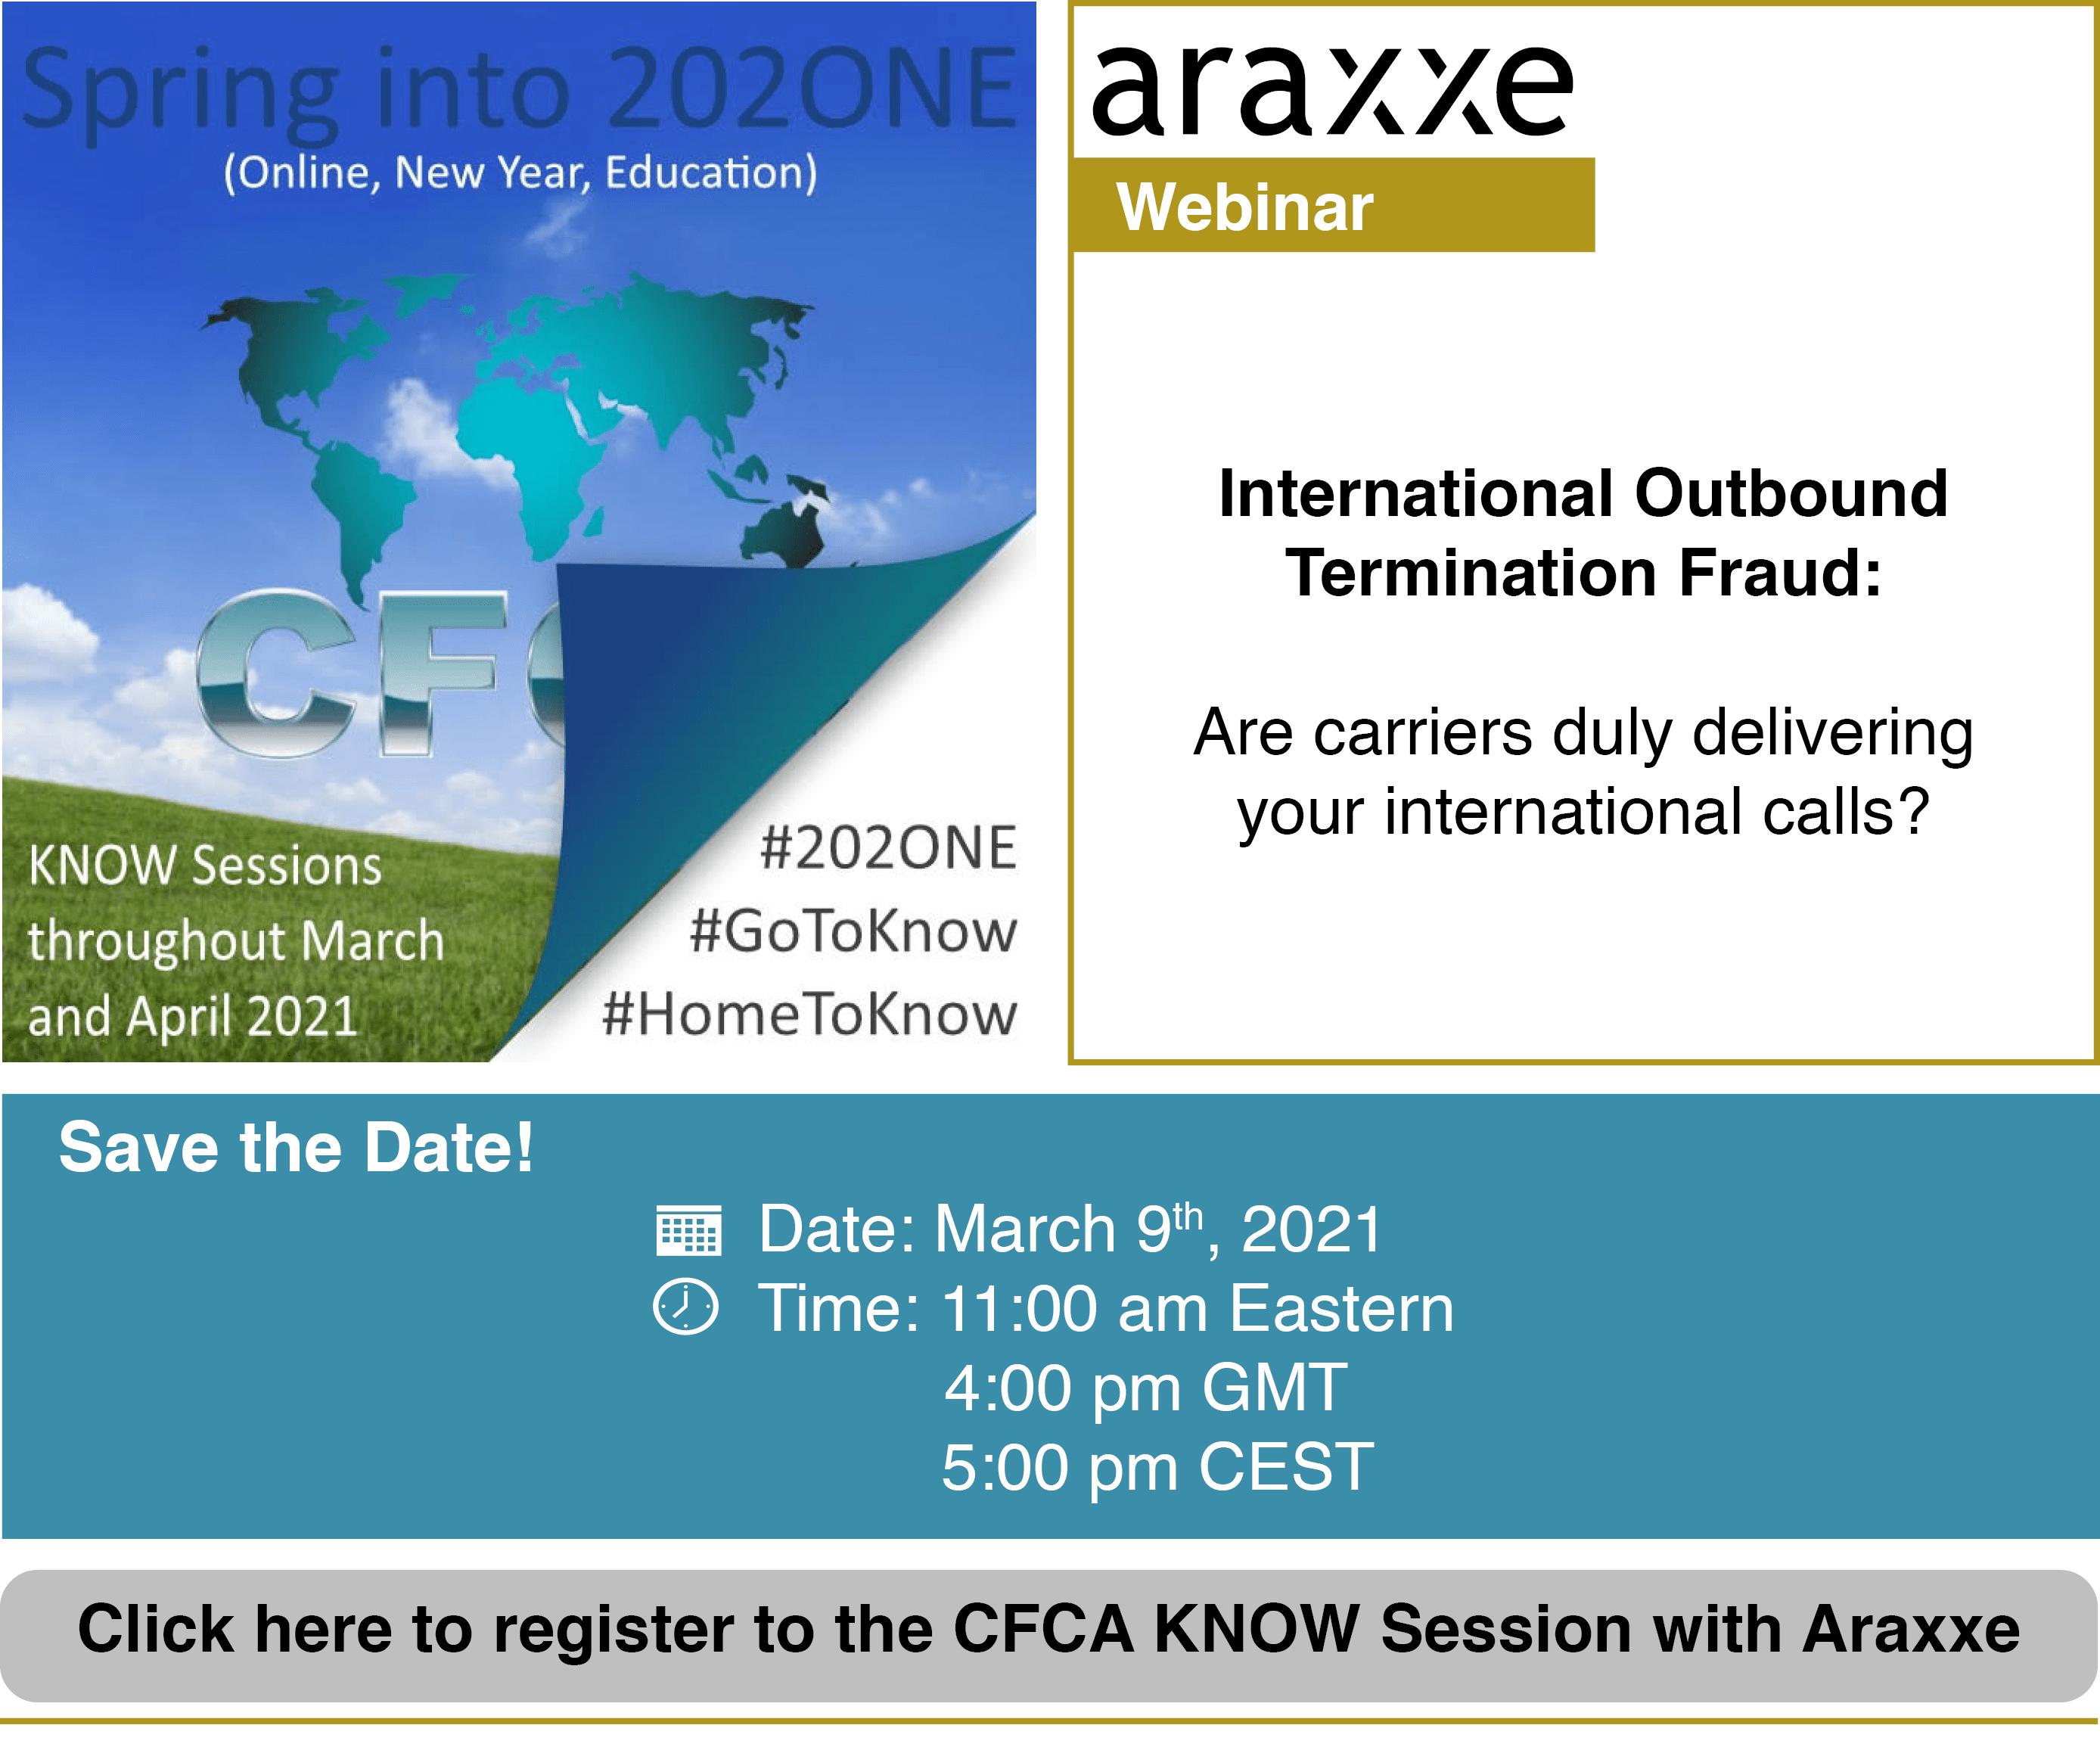 CFCA and Araxxe Webinar: International Outbound Termination Fraud March 9th